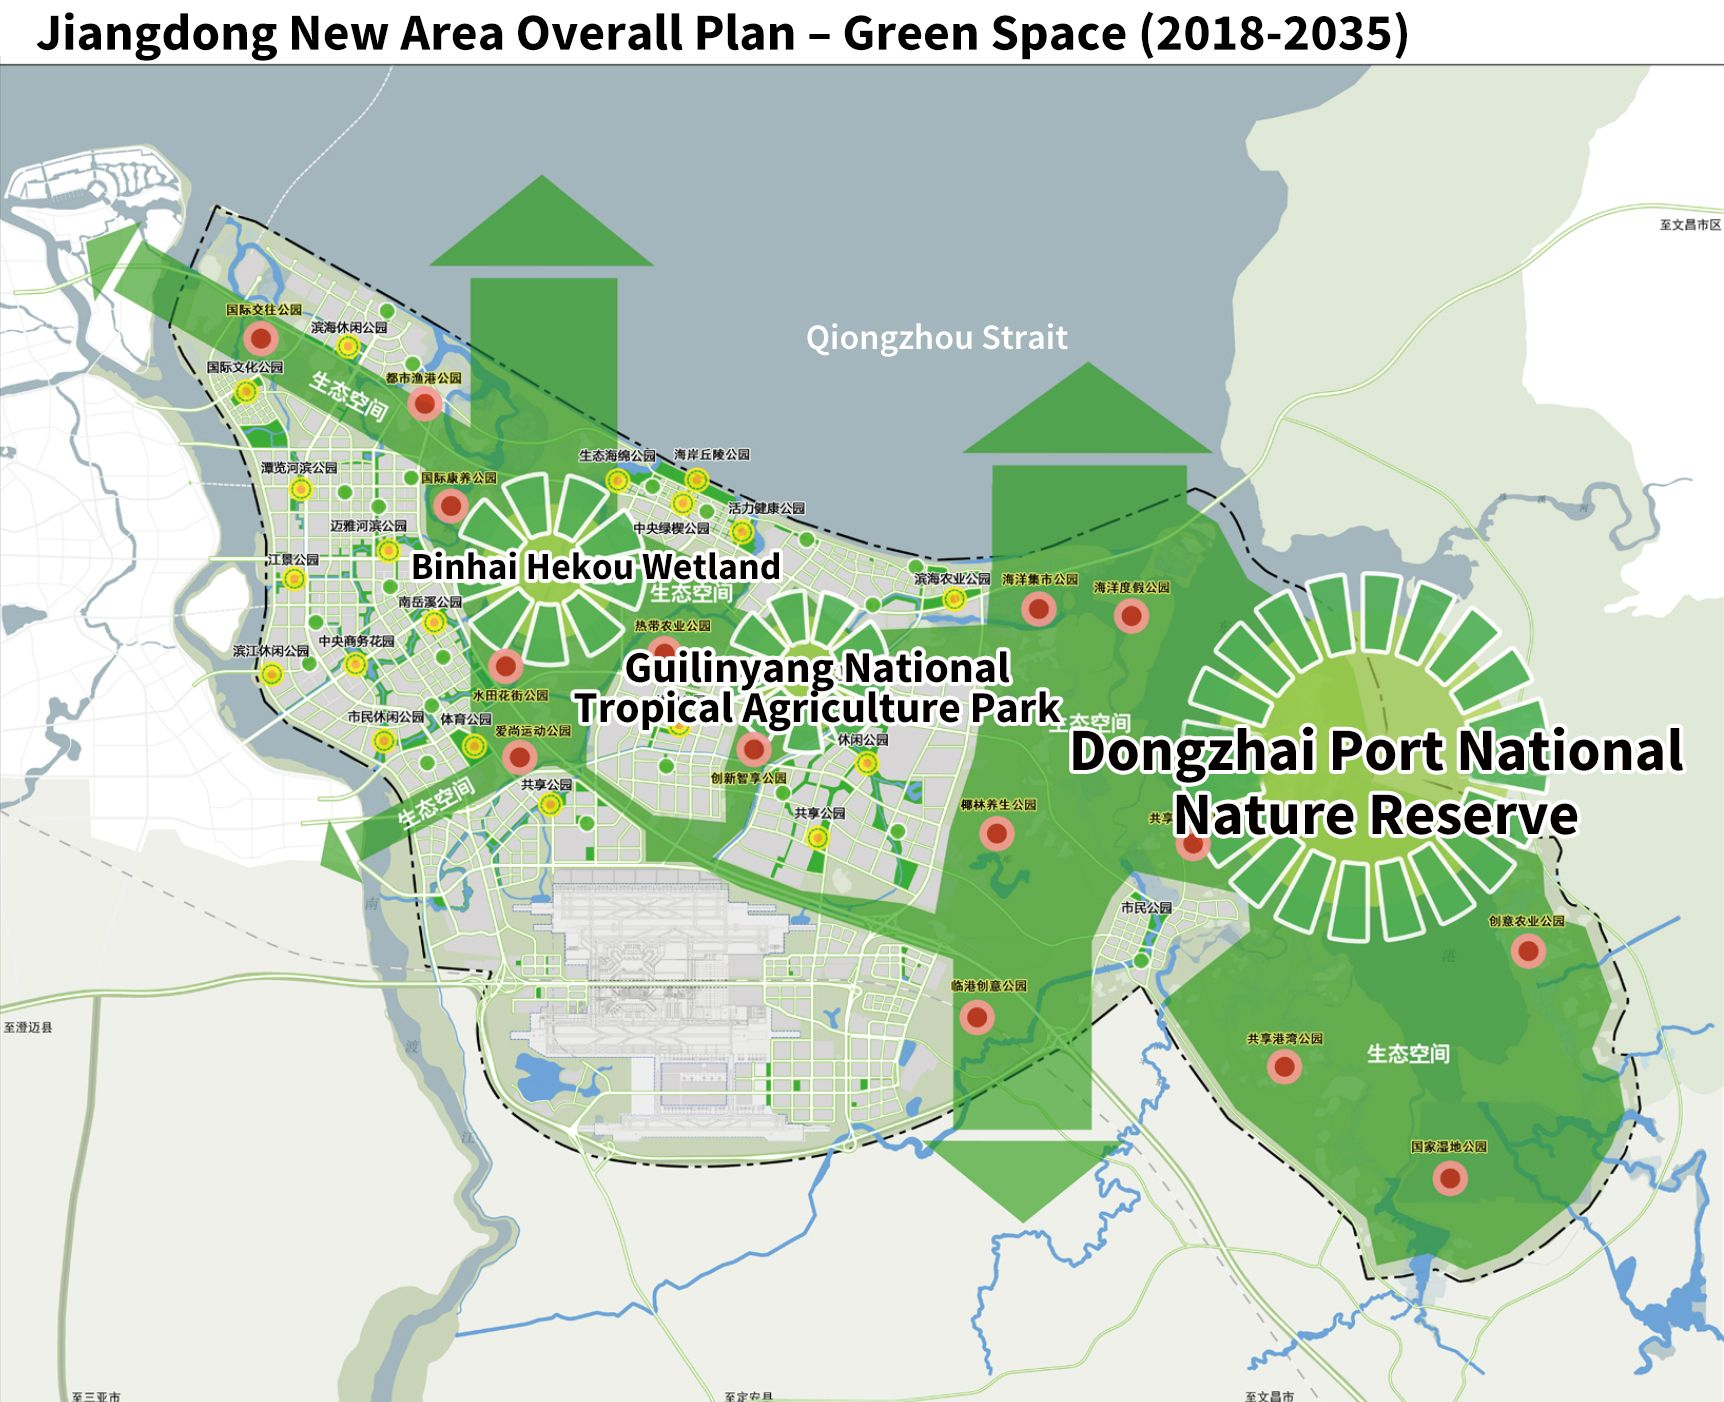 Jiangdong New Area Overall Plan